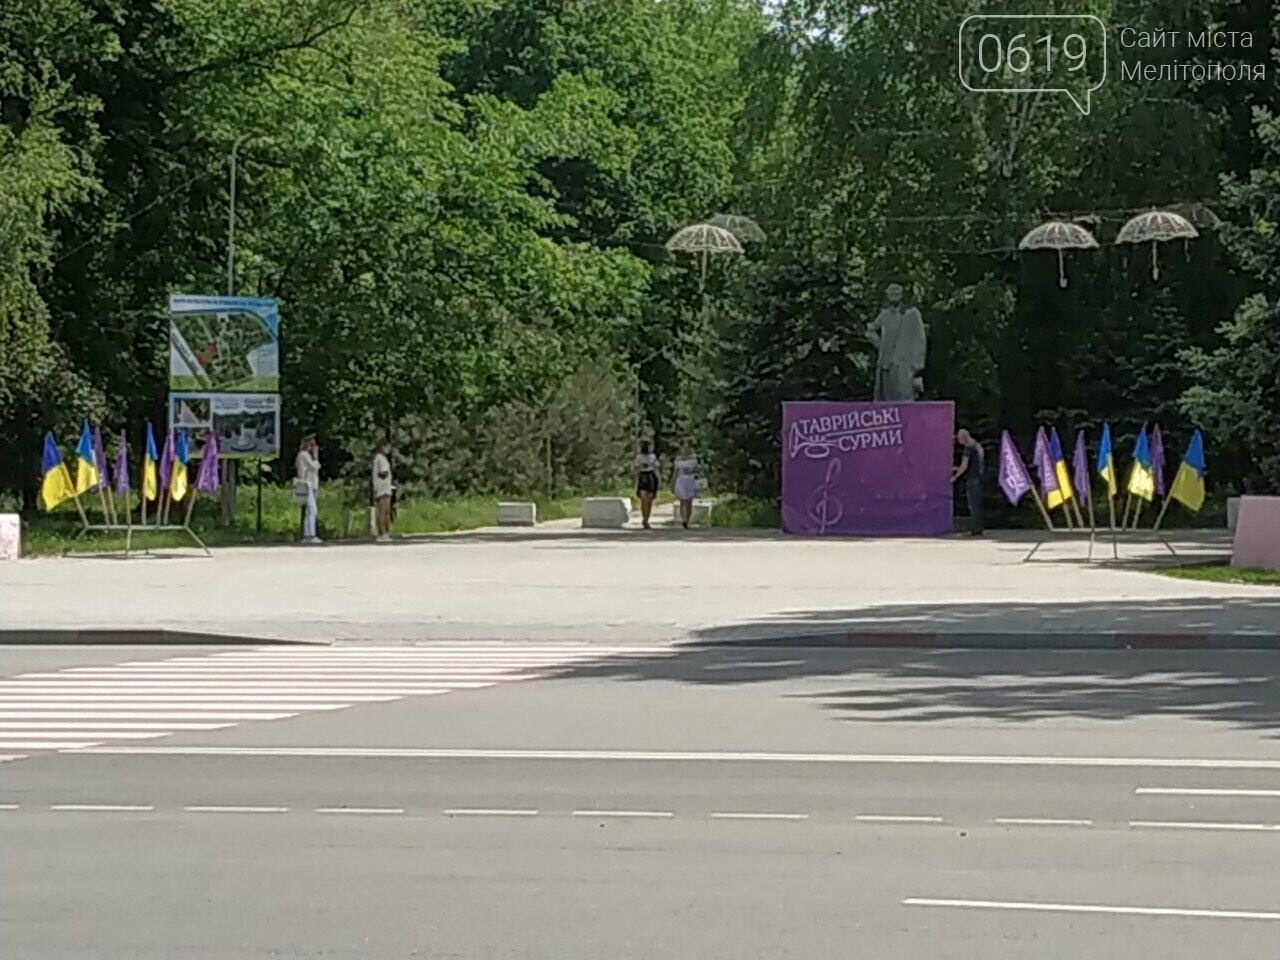 В Мелитополе готовятся к масштабному фестивалю , фото-1, Фото сайта 0619